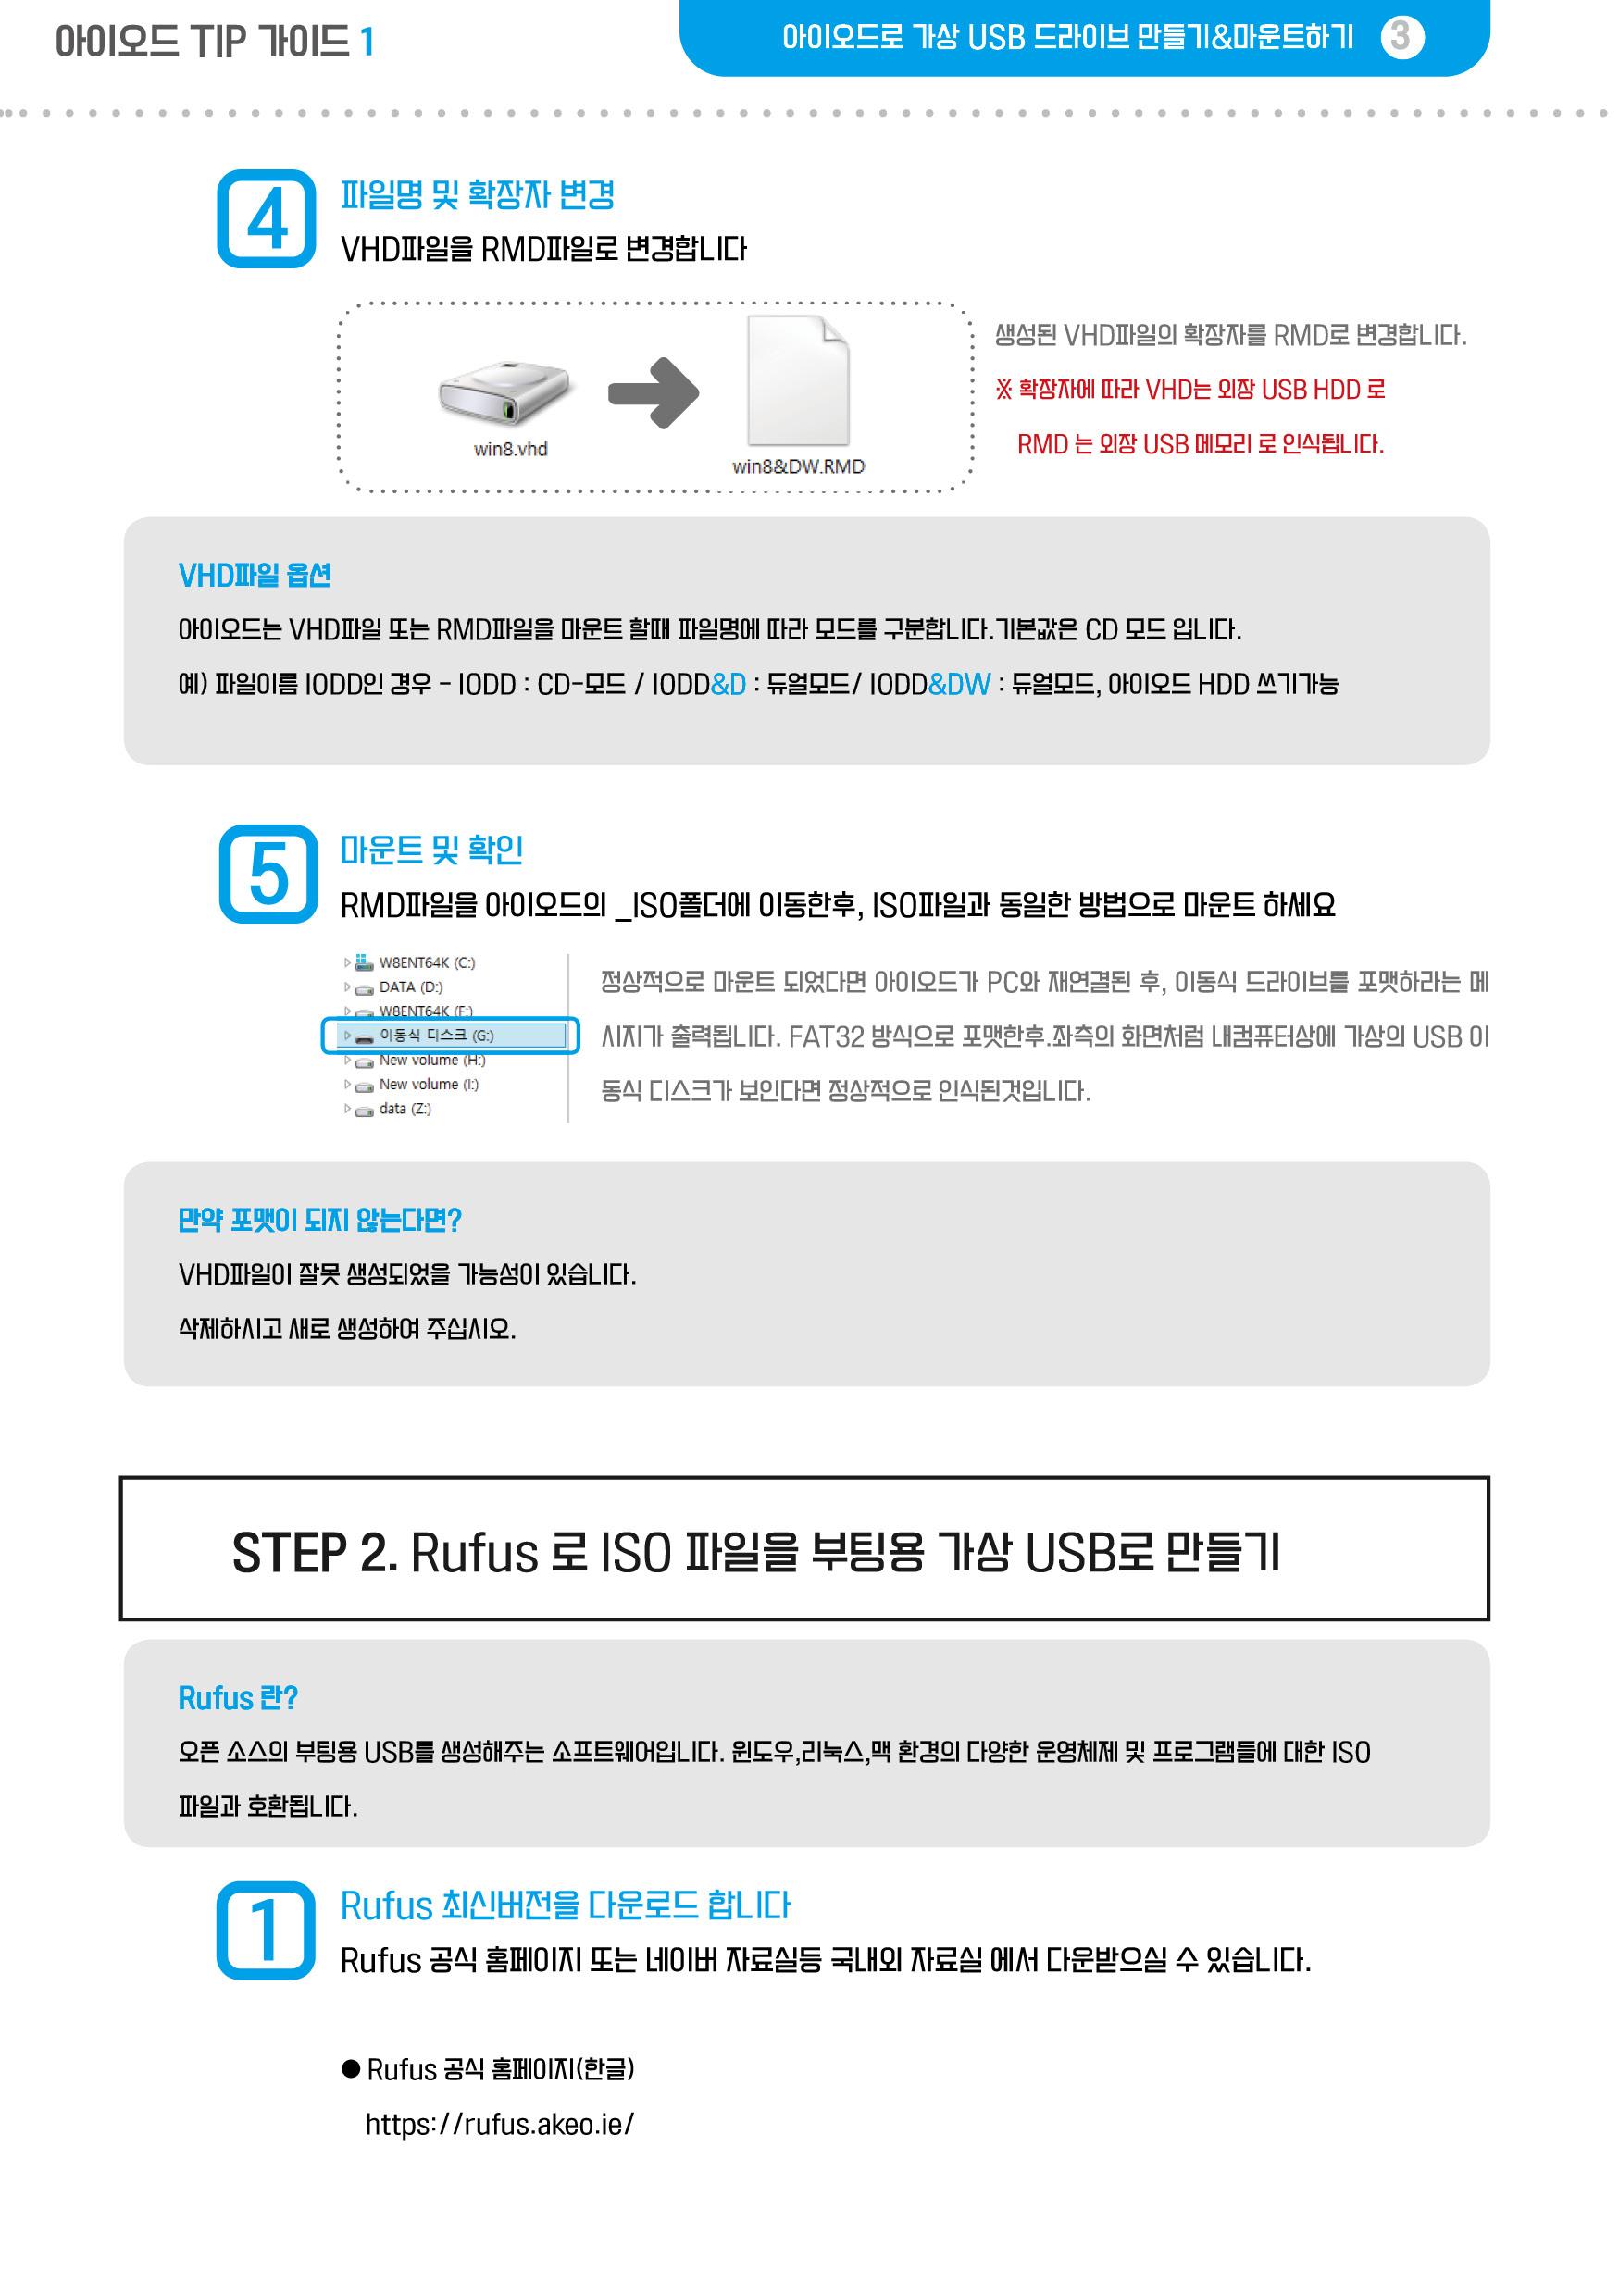 IODD 가상 USB 메모리 가이드3